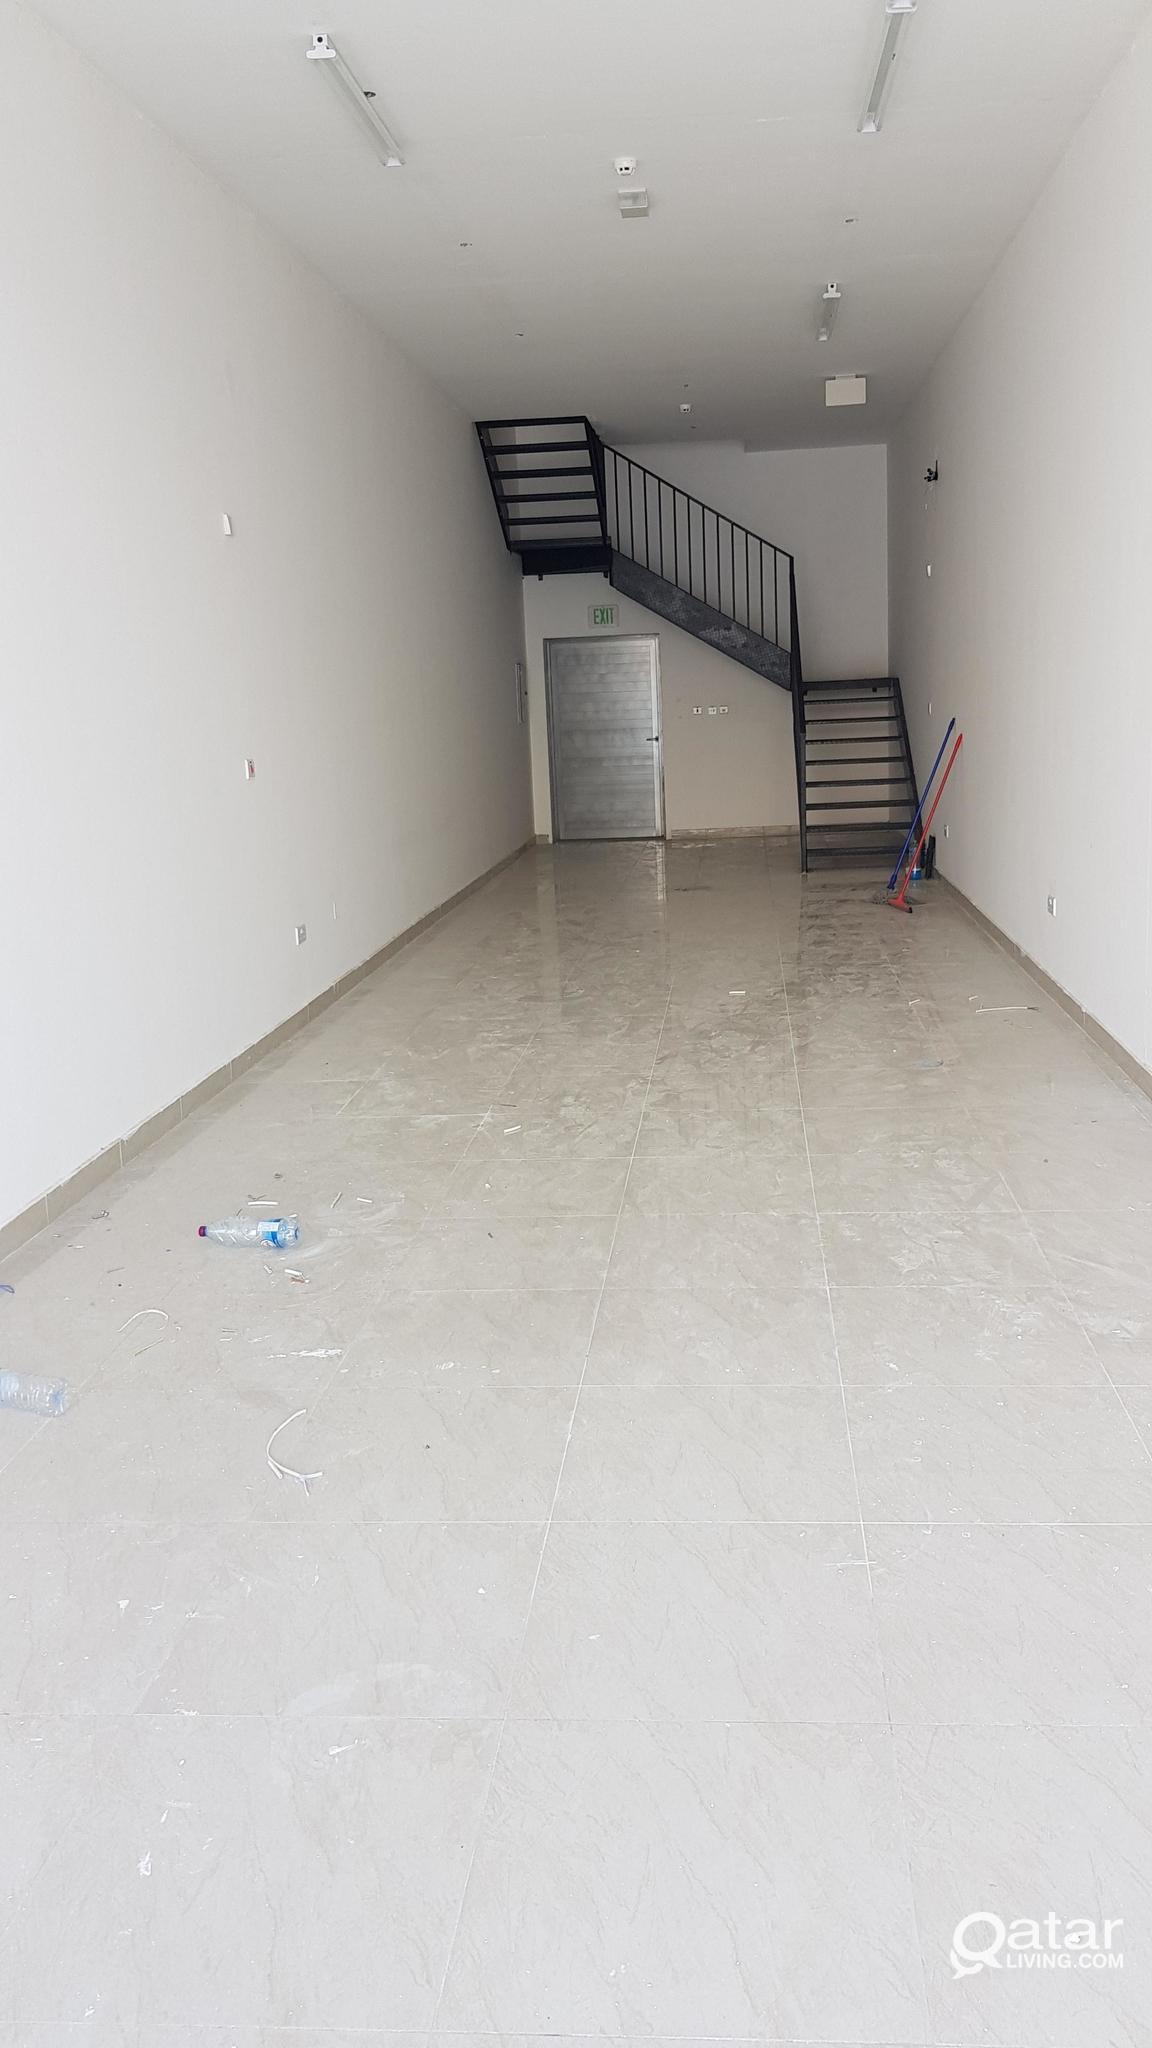 Shop for rent at azizya 17×3.7 m mezzanine 20000 q